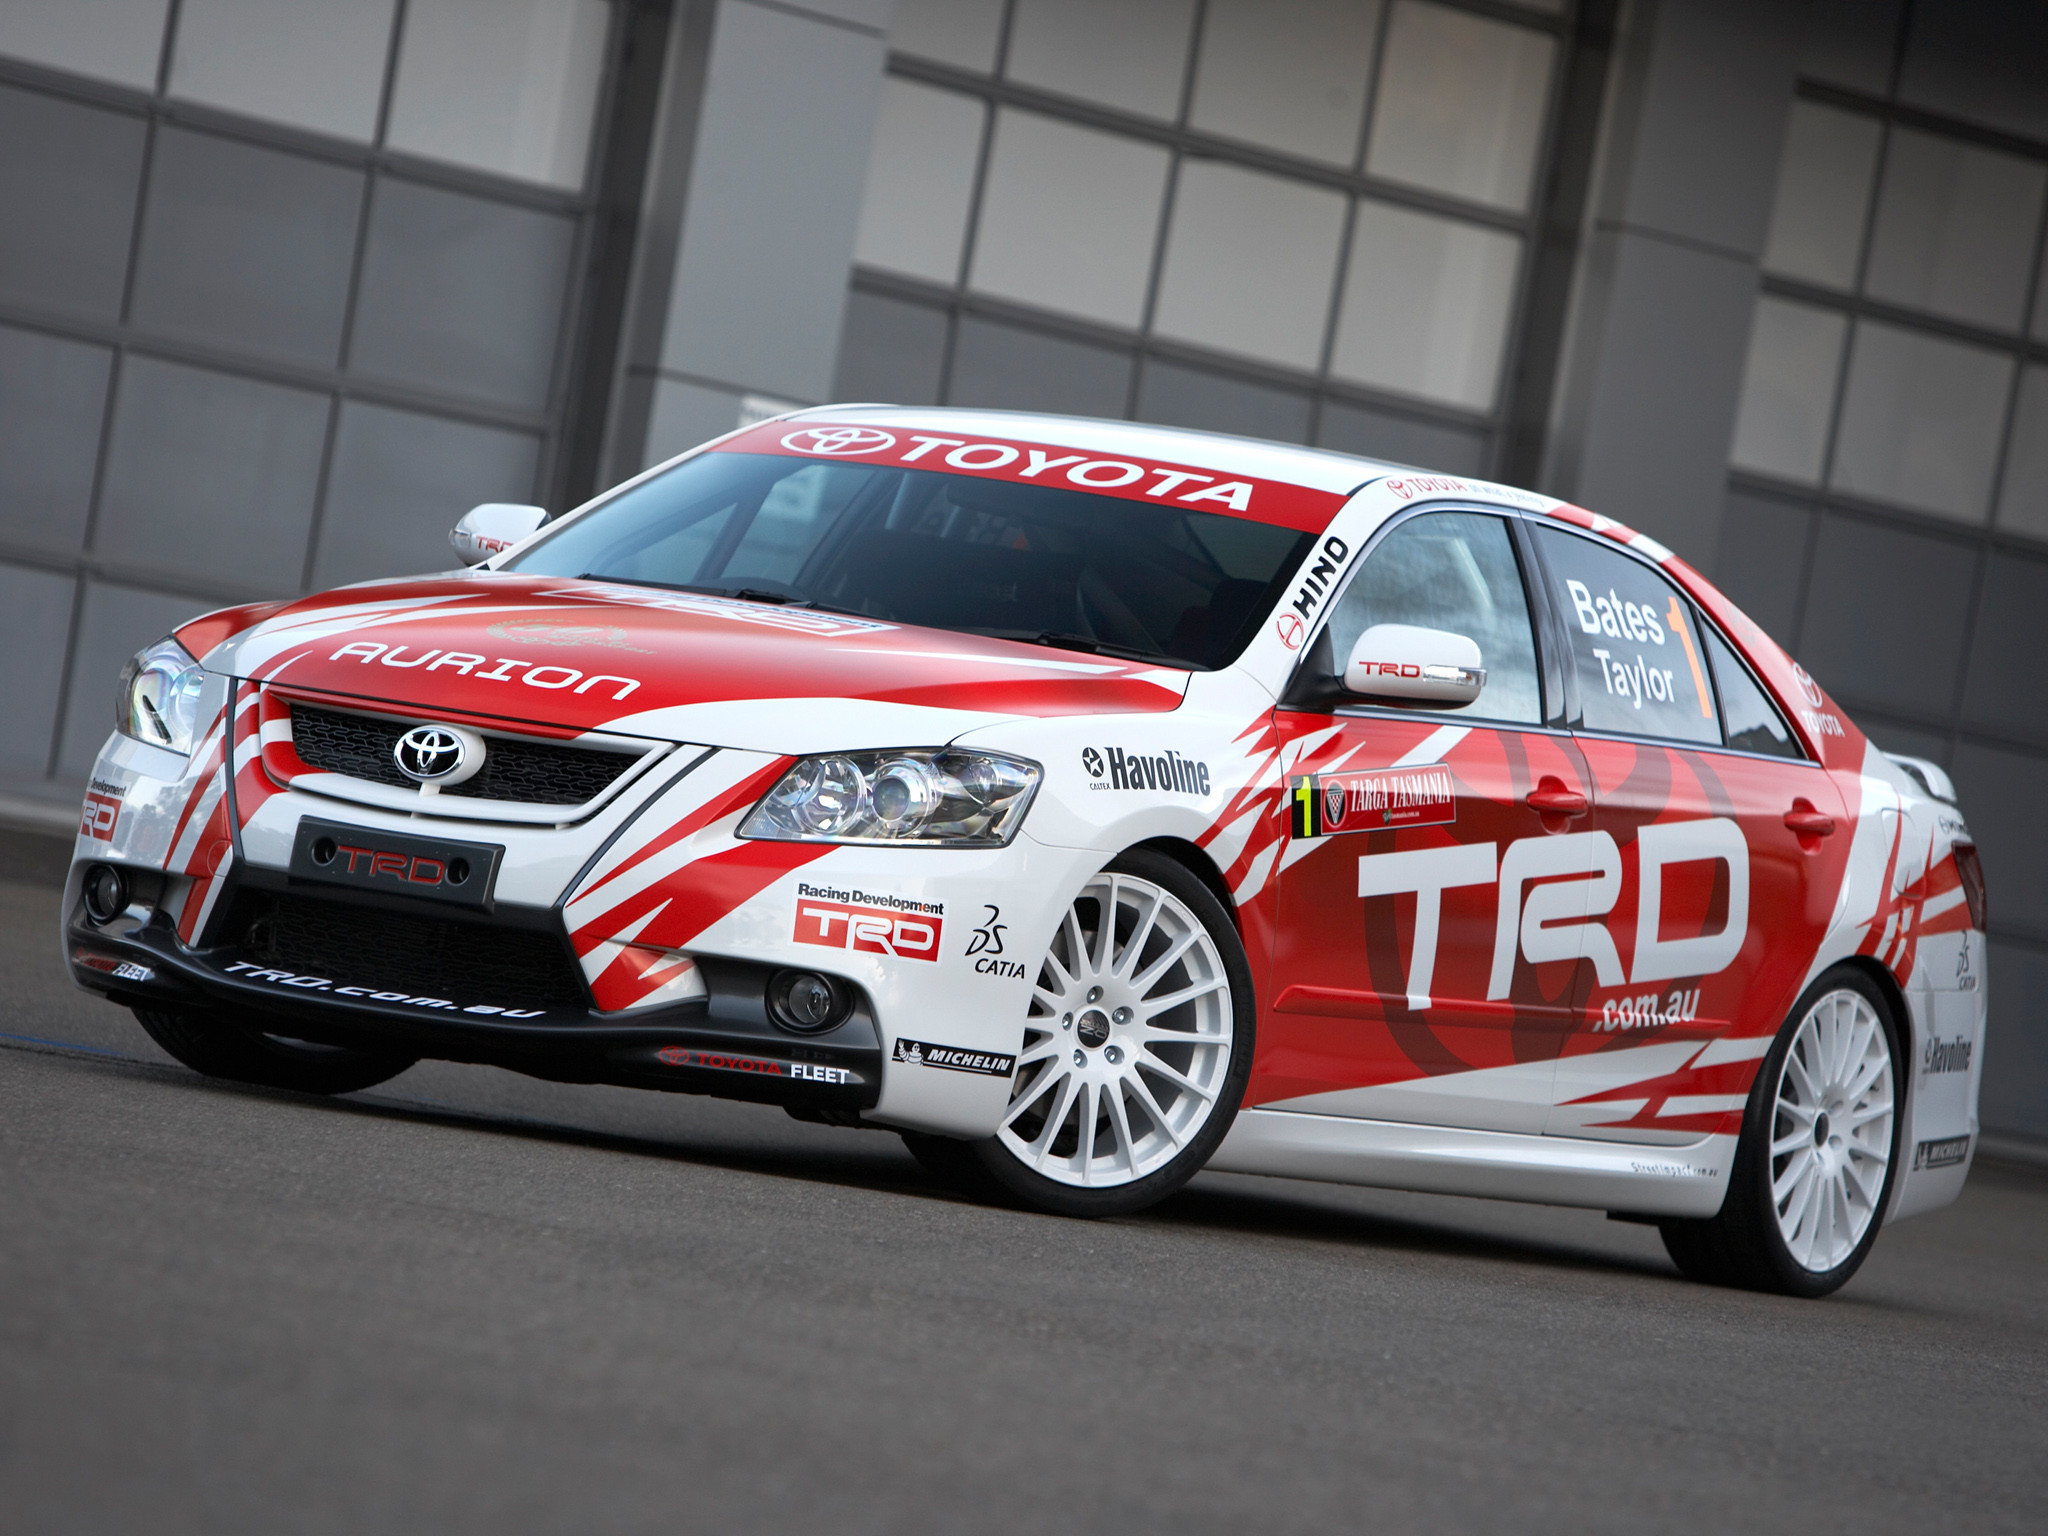 2007 TRD Toyota Aurion Race XV40 racing tuning wallpaper | |  126006 | WallpaperUP